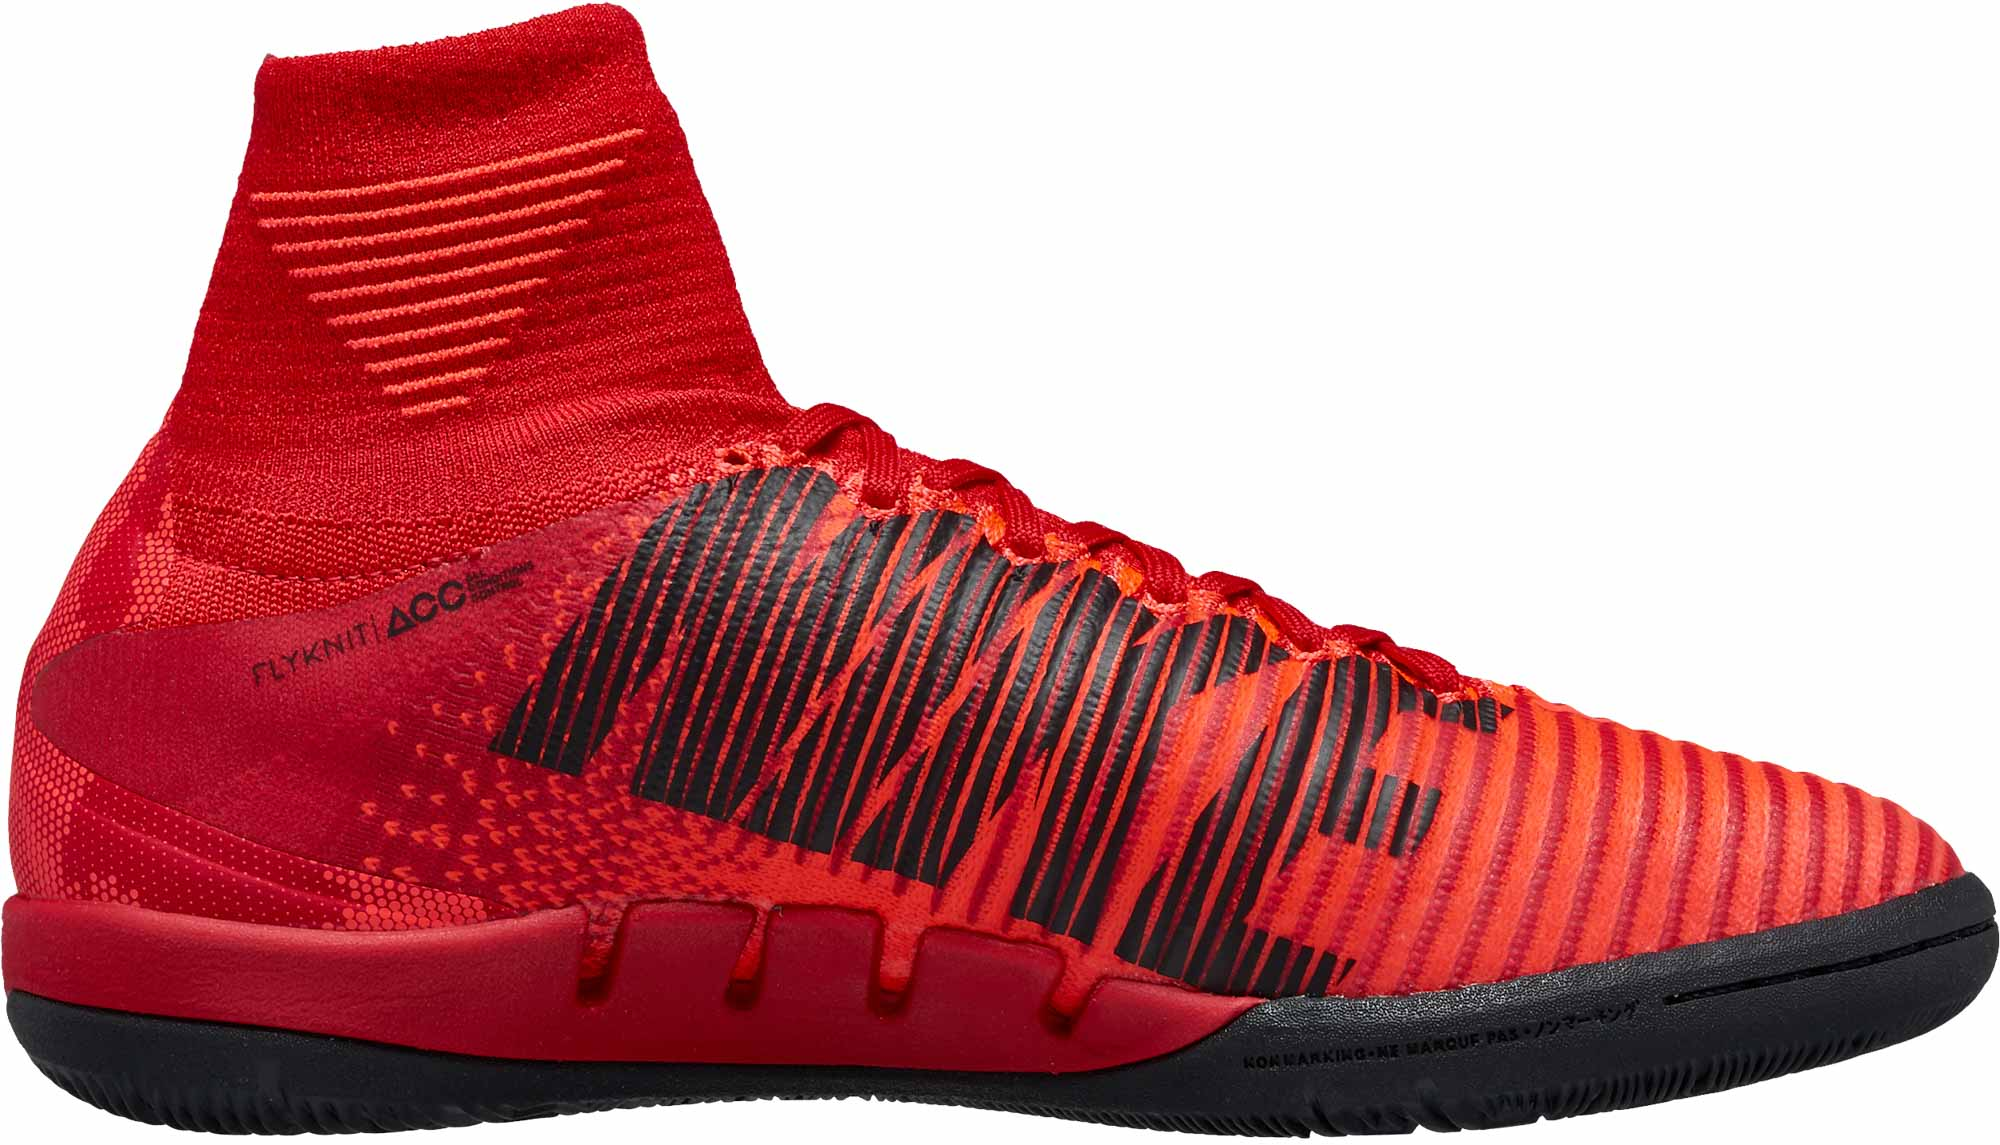 Nike MercurialX Proximo II IC – University Red/Black